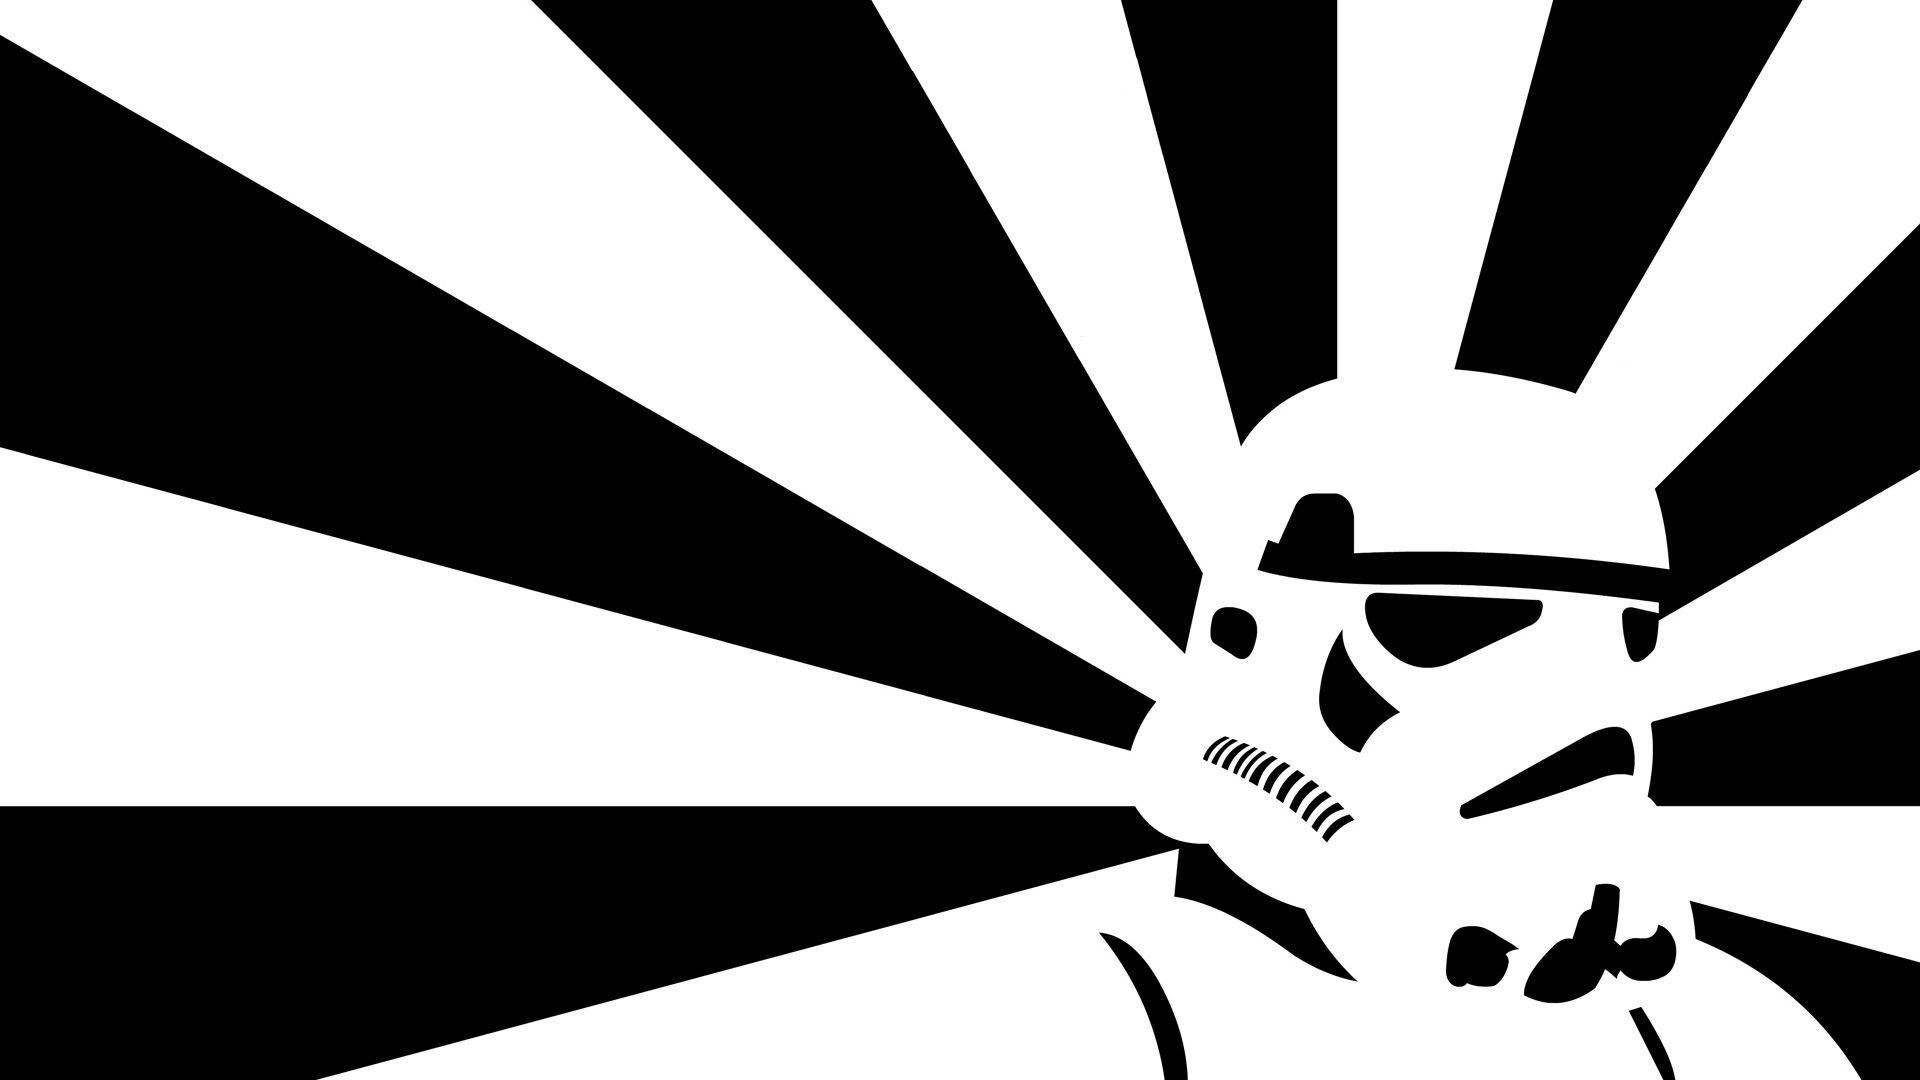 Star Wars Stormtroopers Wallpaper 1920x1080 248921 Wallpaperup